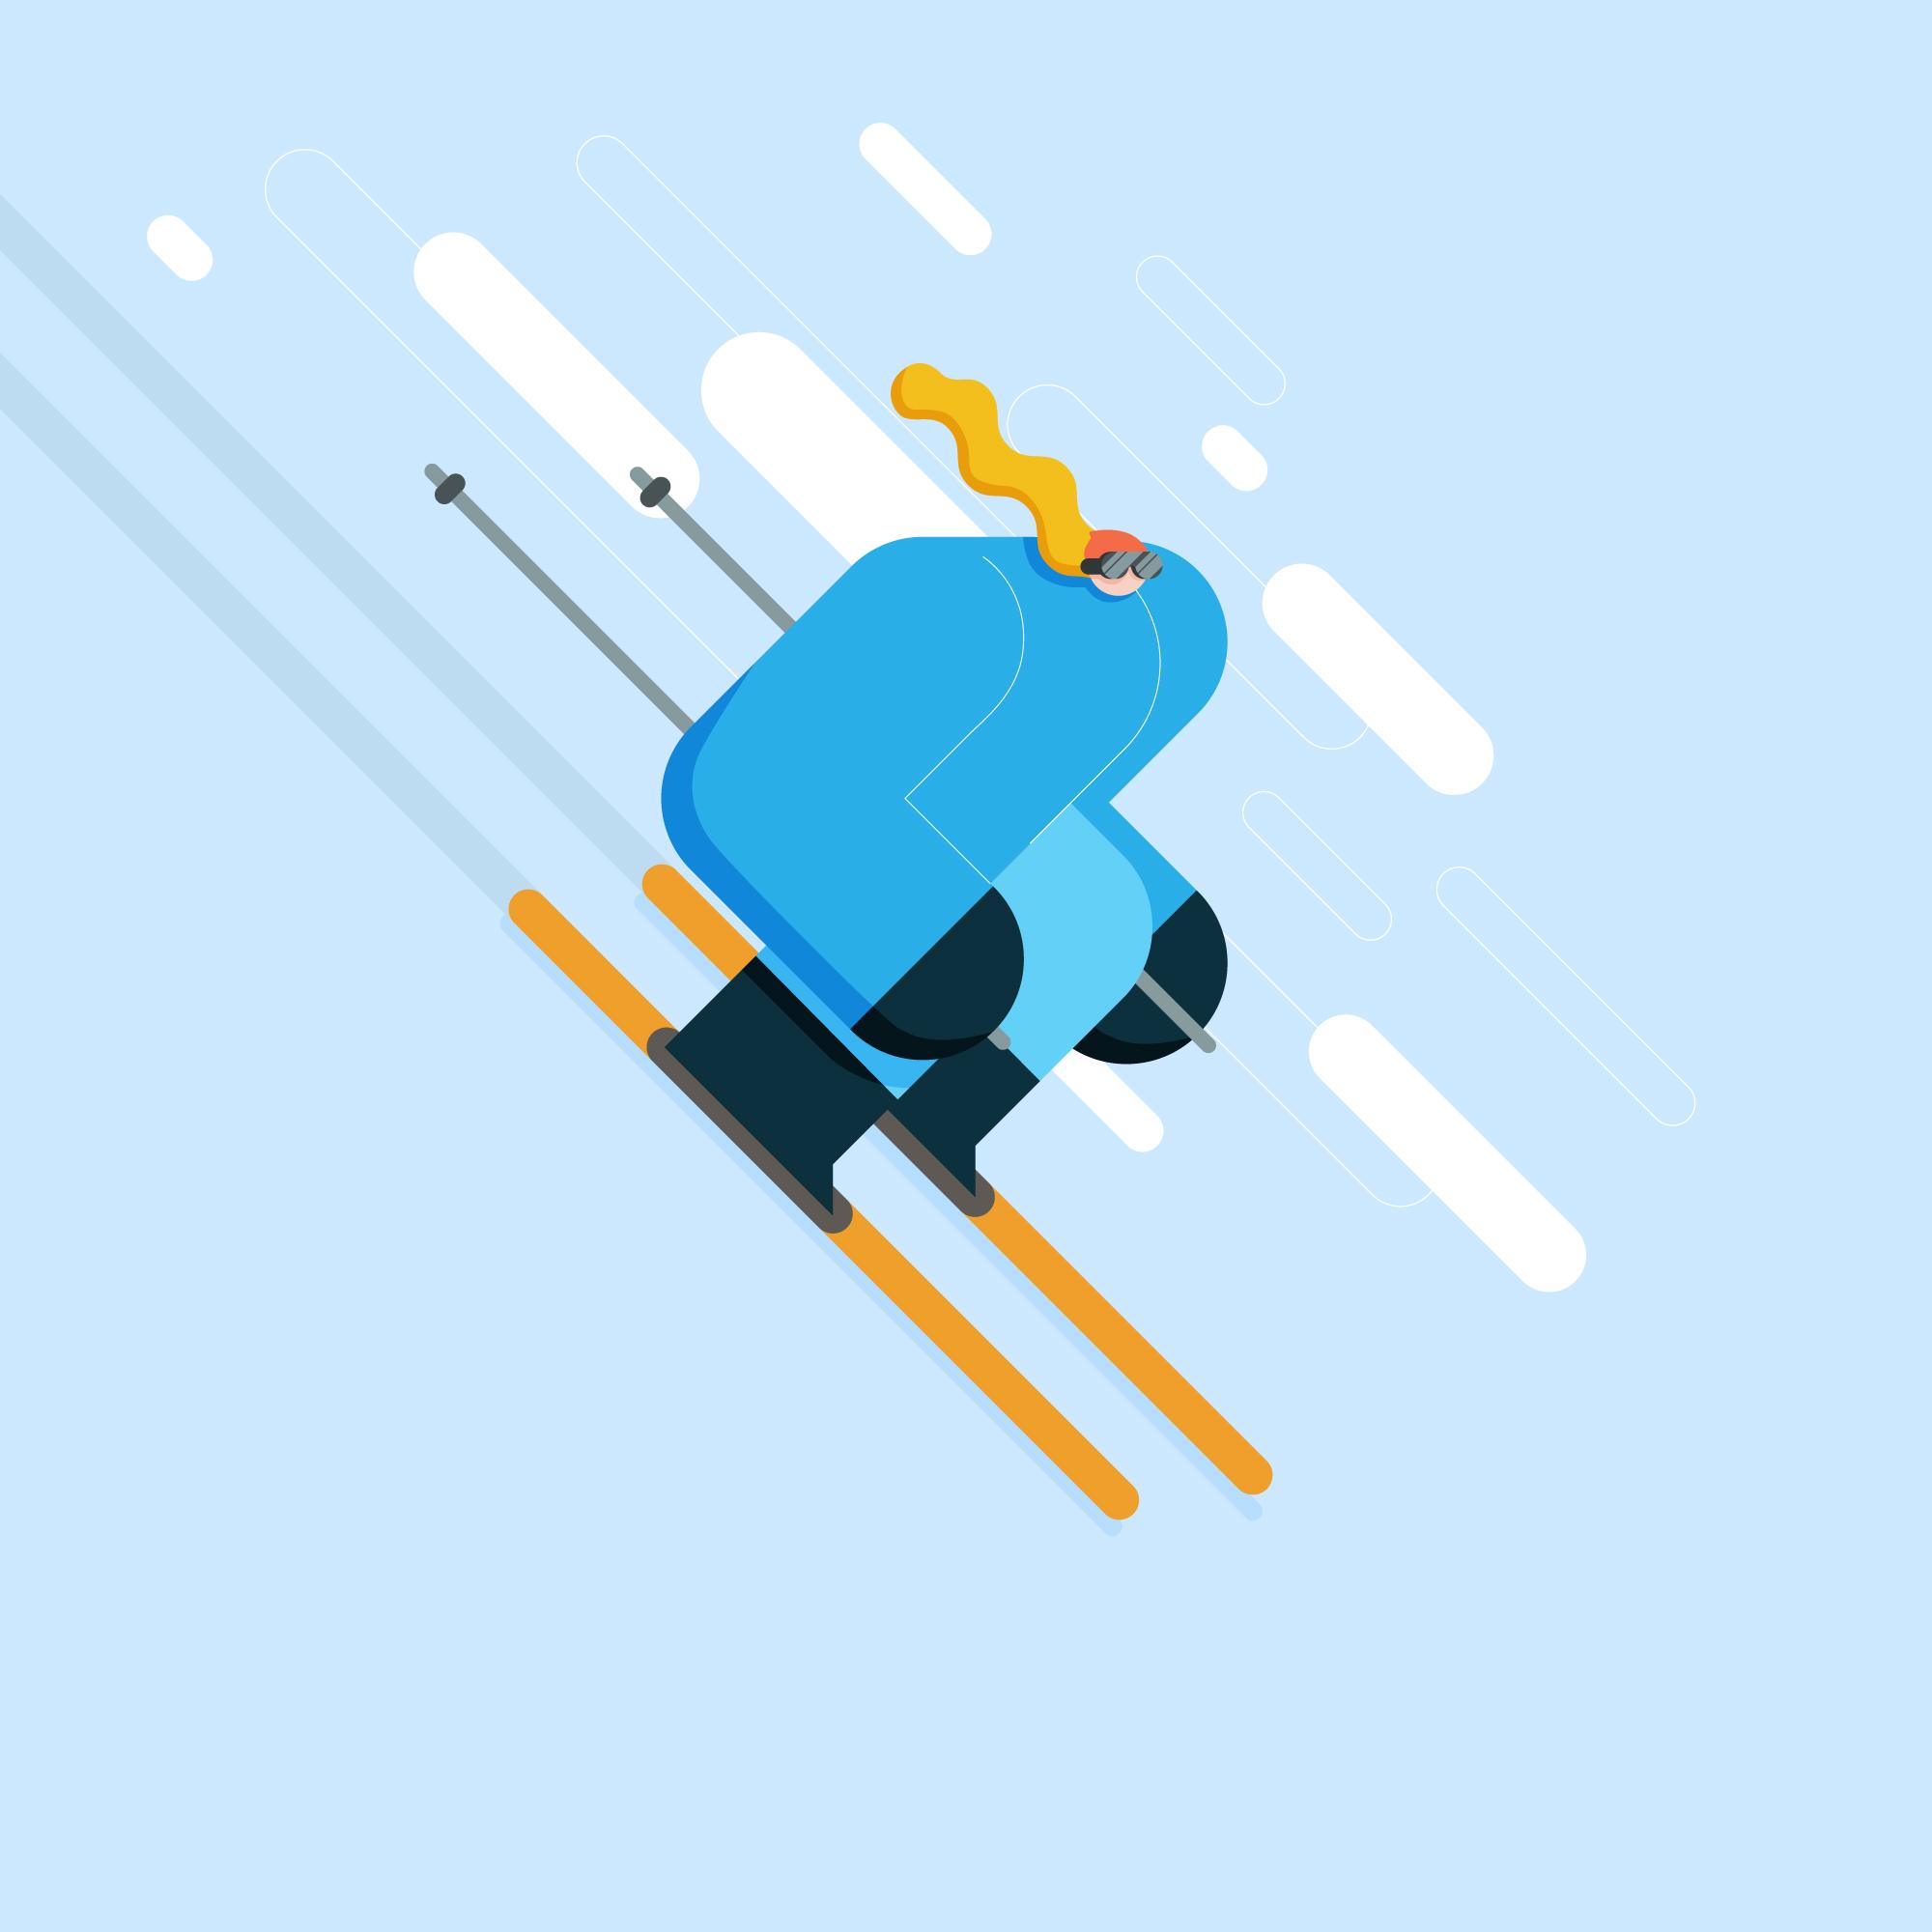 BigBuds_Skiing_Insta.jpg